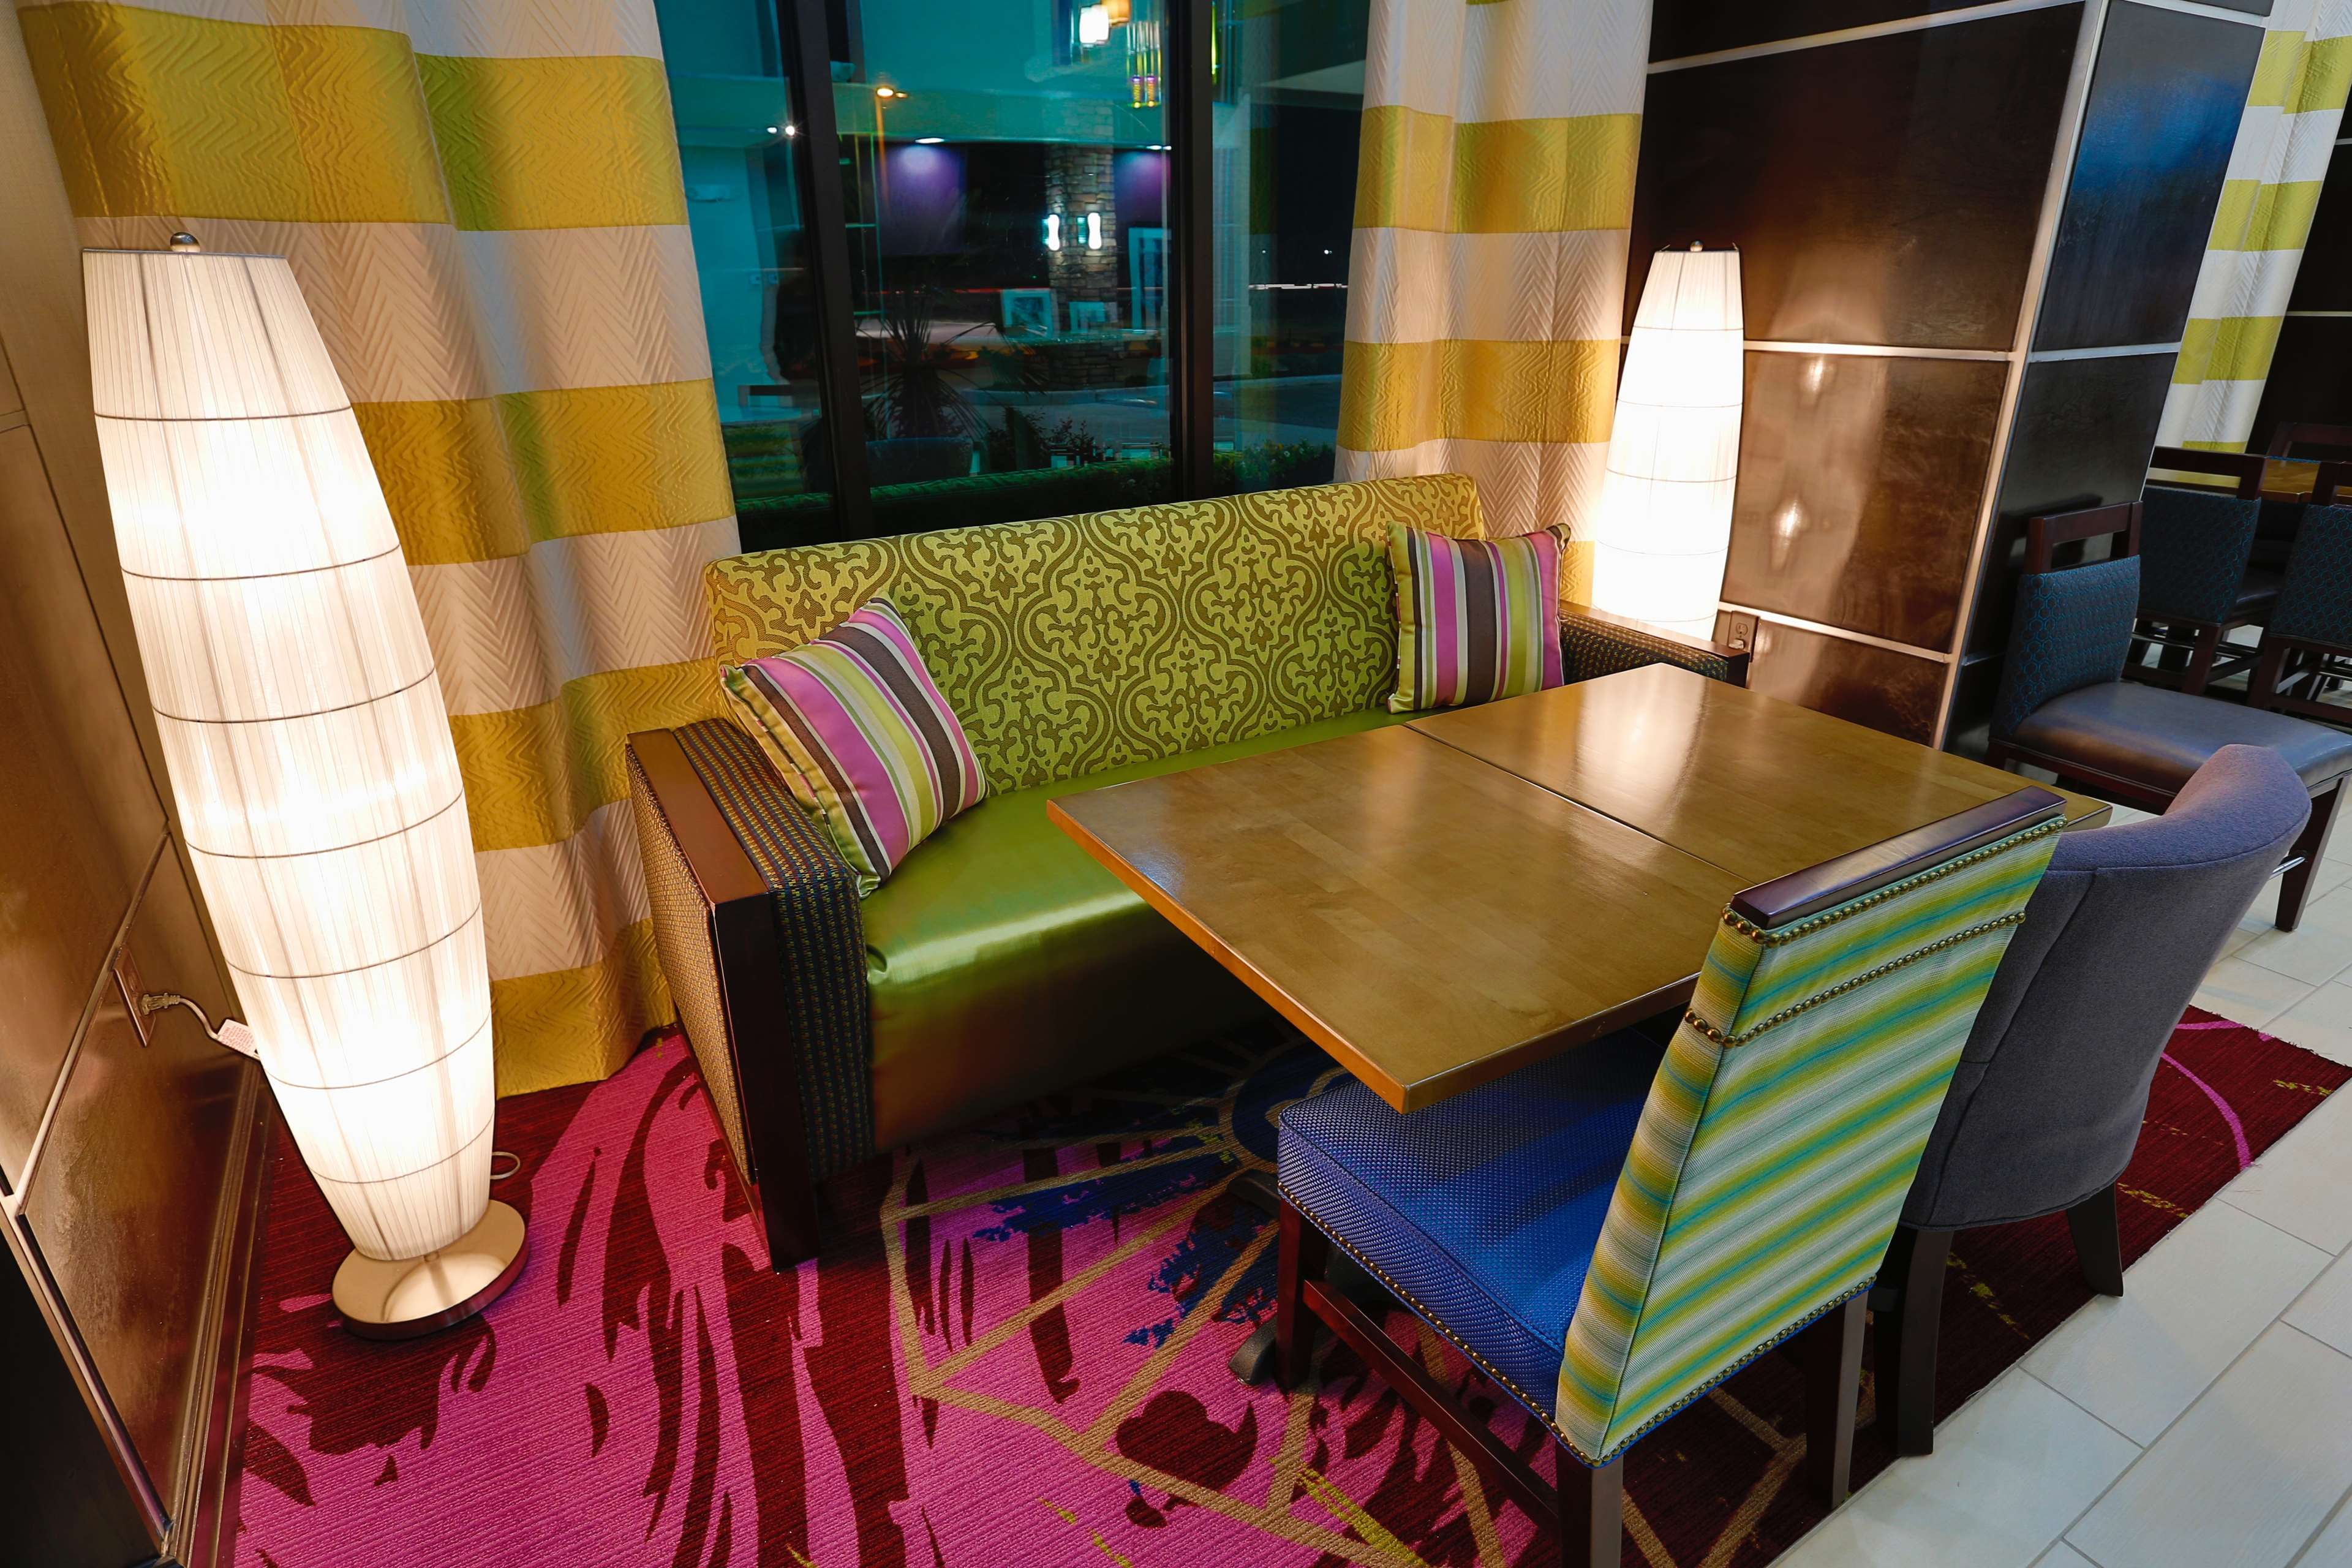 Hampton Inn & Suites Missouri City, TX image 5